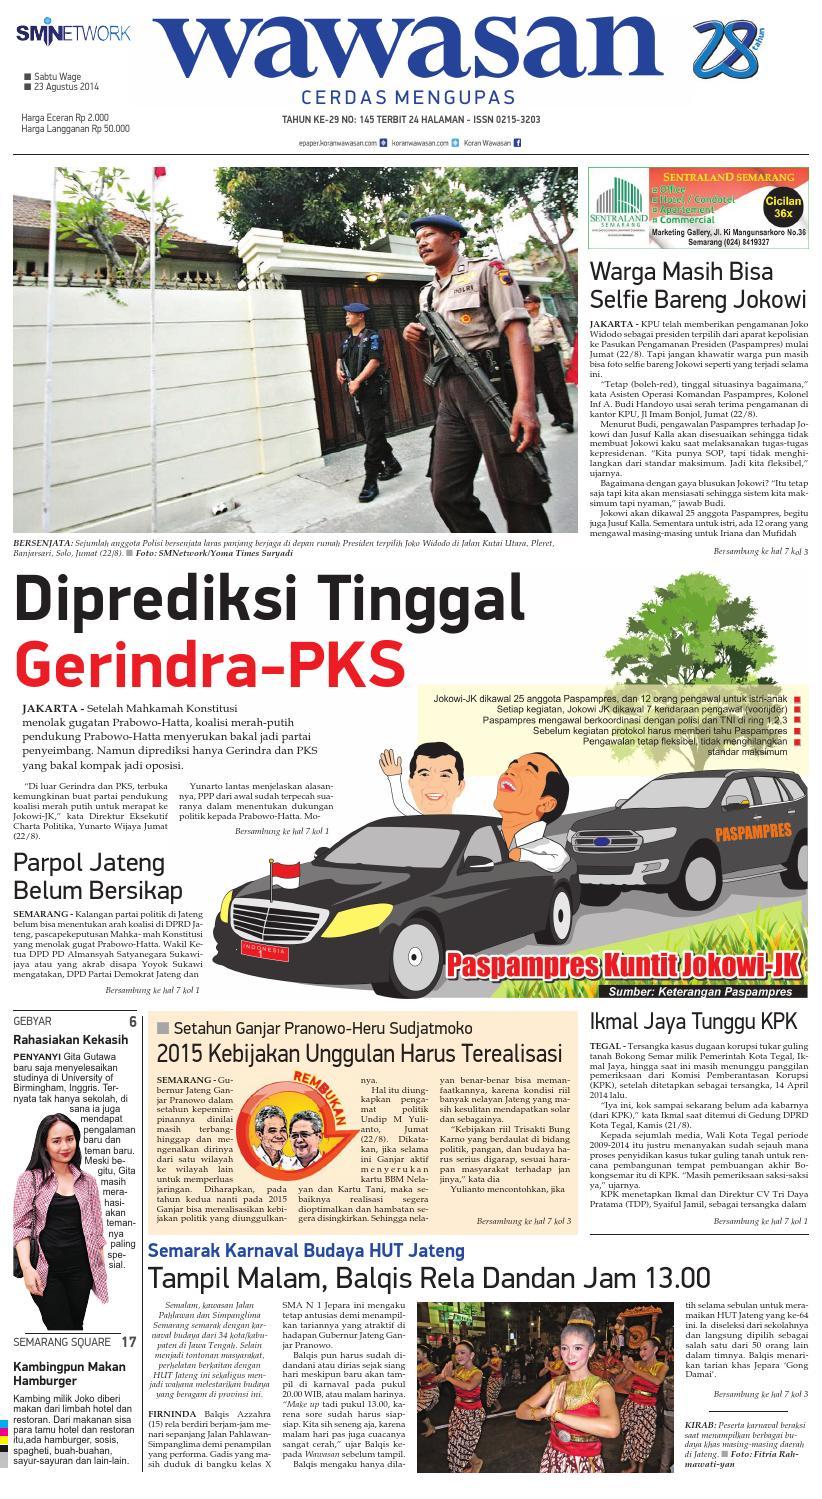 Wawasan 23 Agustus 2014 By Koran Pagi Issuu Produk Ukm Bumn Ring Berlian Eropa